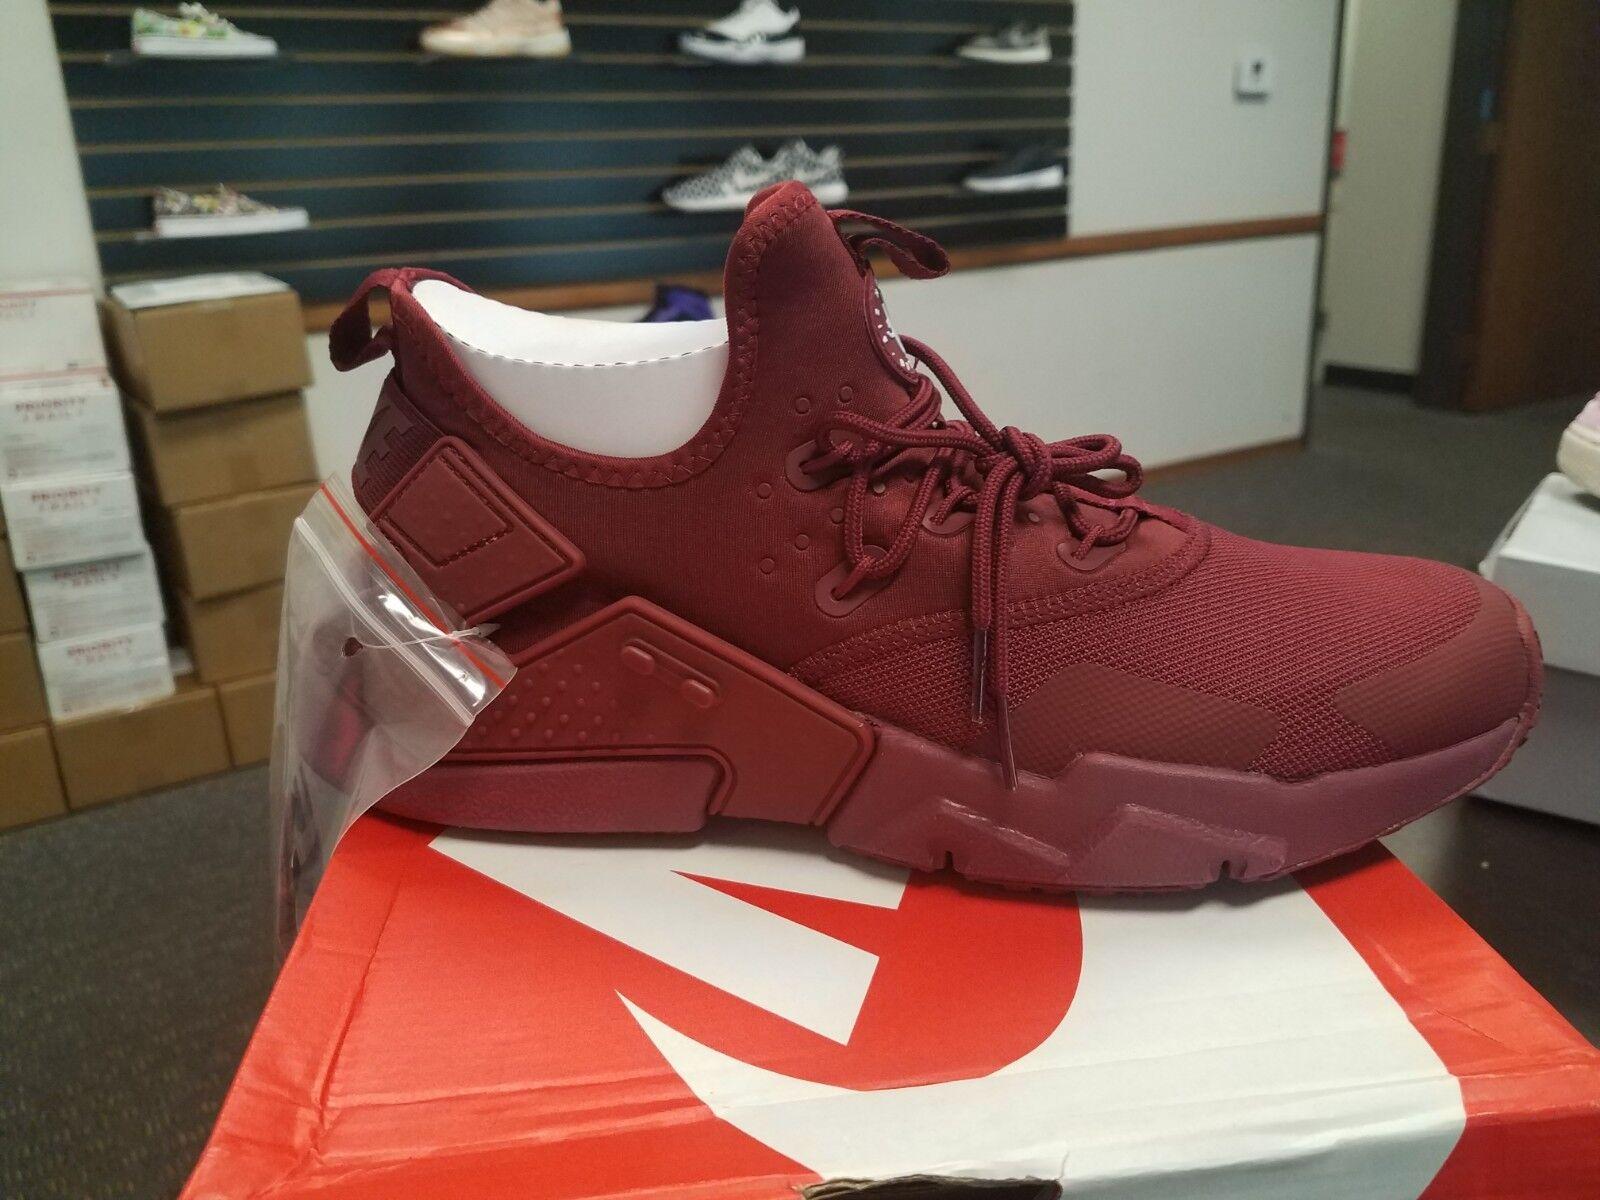 Brand New in Box Men's Nike Air Huarache Drift Running shoes AH7334-600 TEAM RED